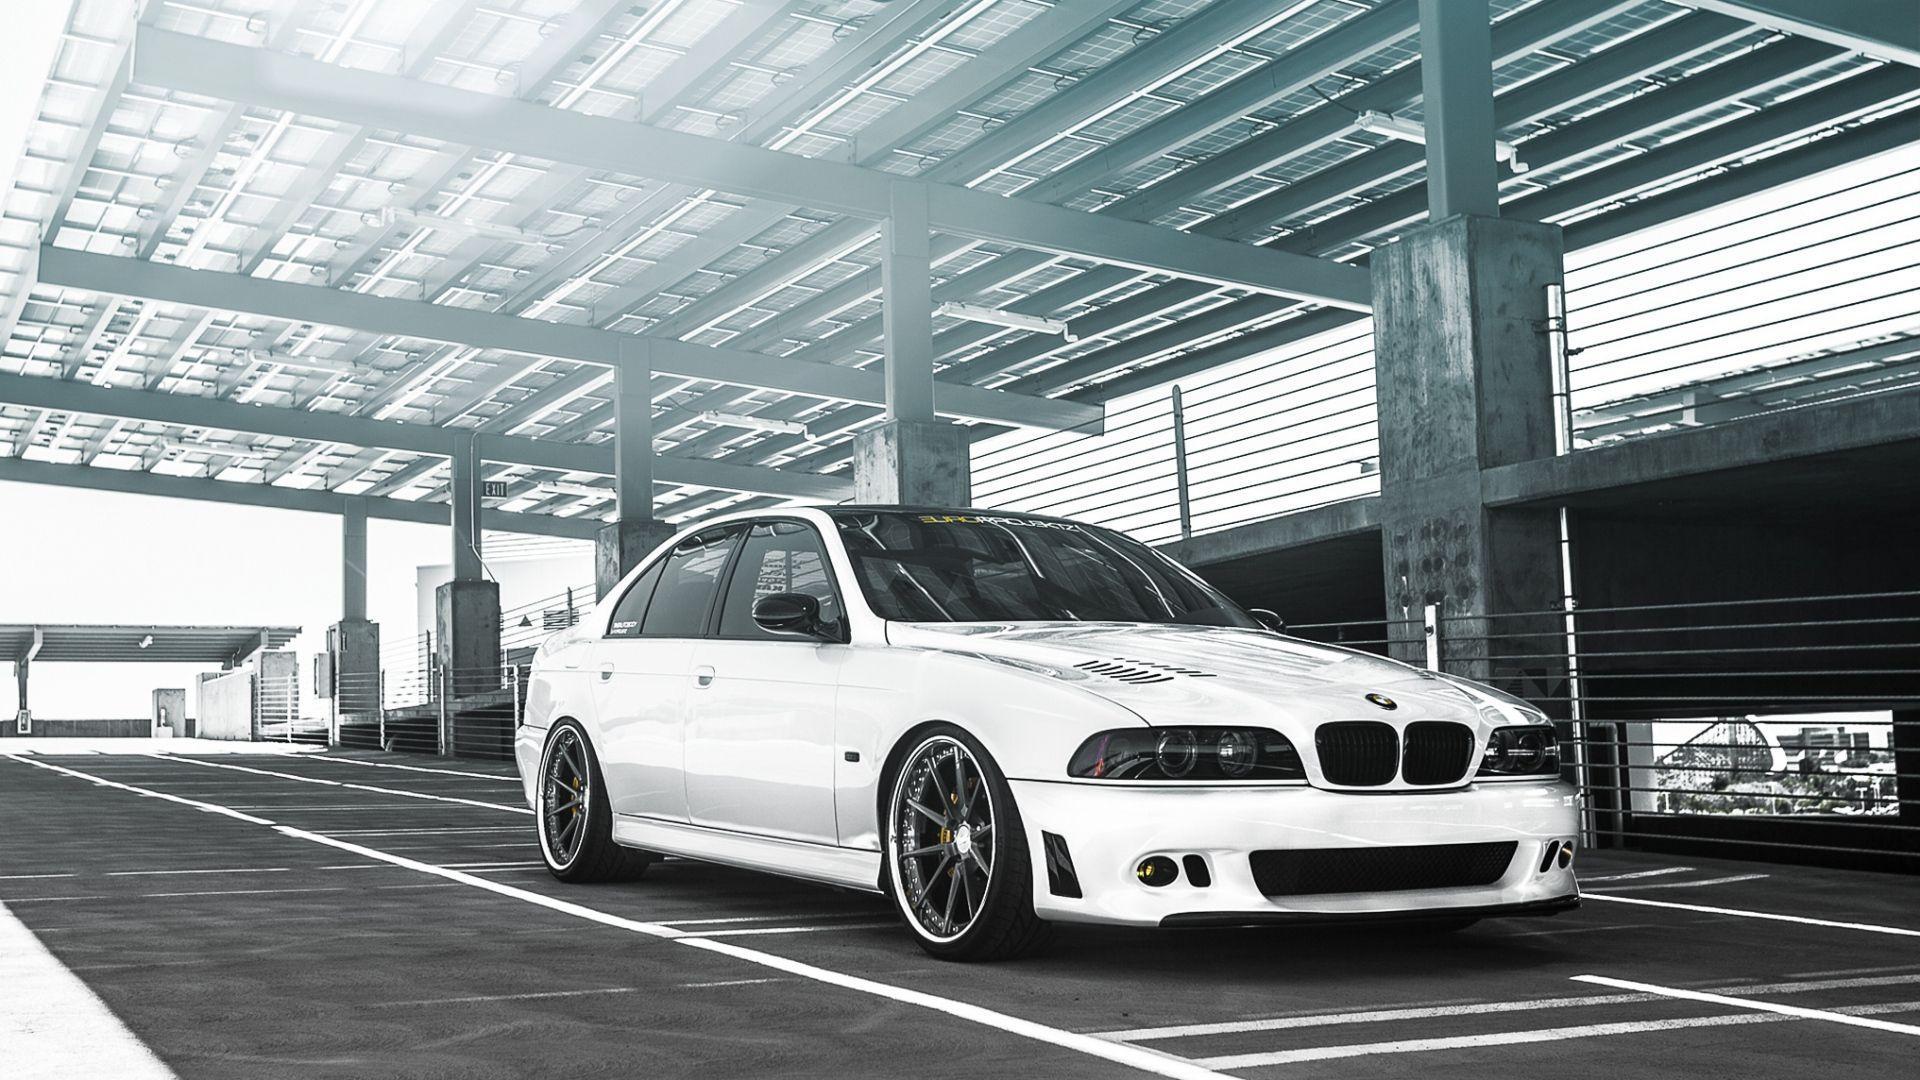 BMW E39 M5 Wallpapers - Wallpaper Cave